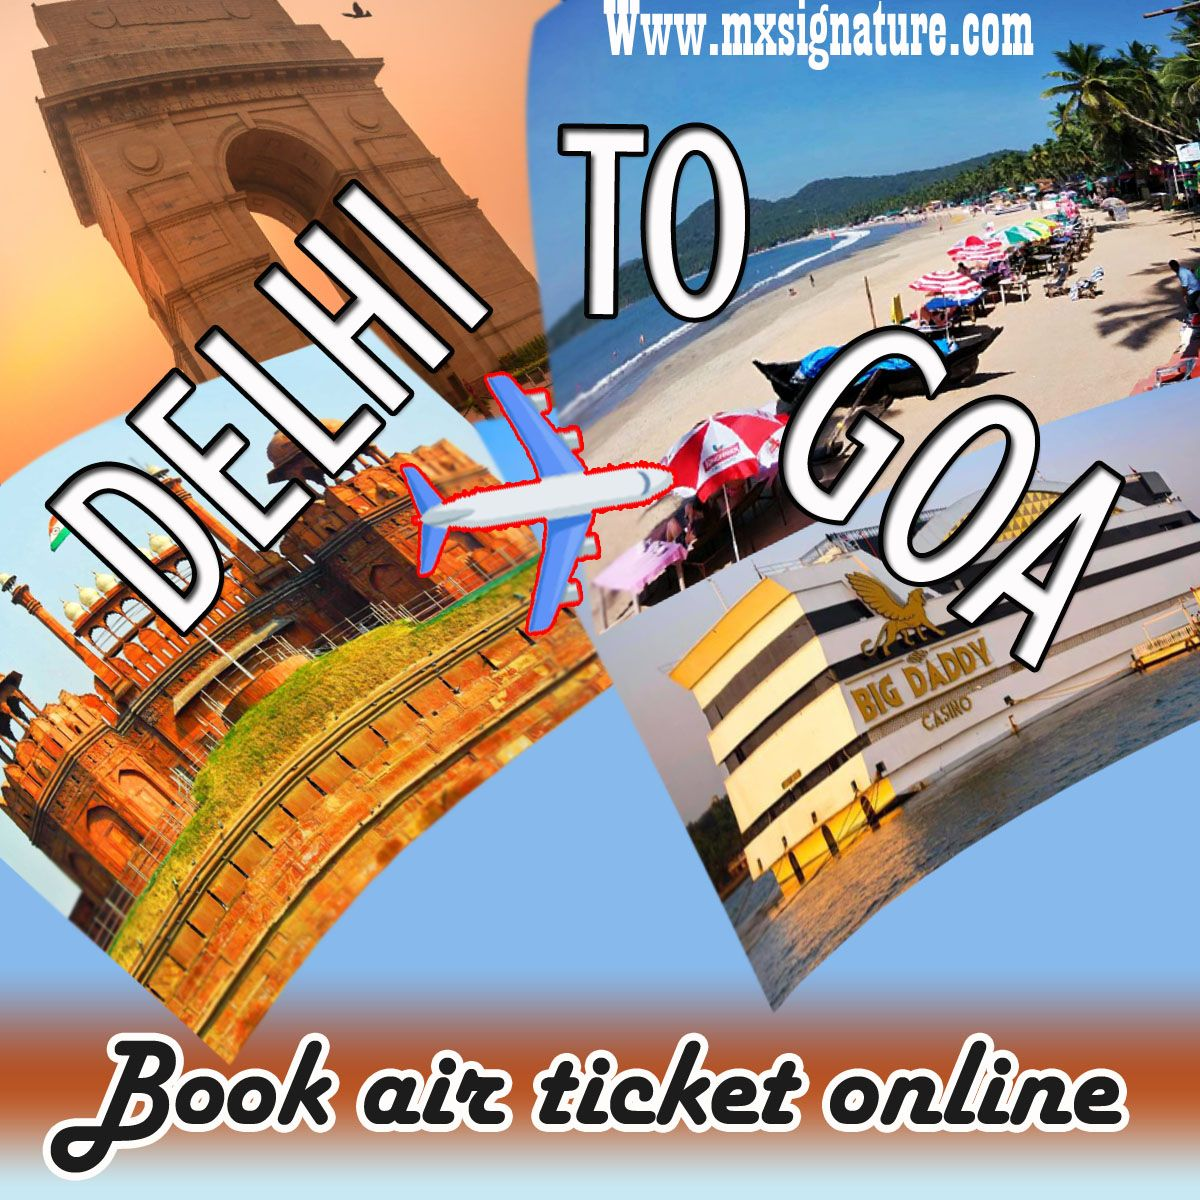 Book Delhi To Goa Flight Online travel agency, Holiday